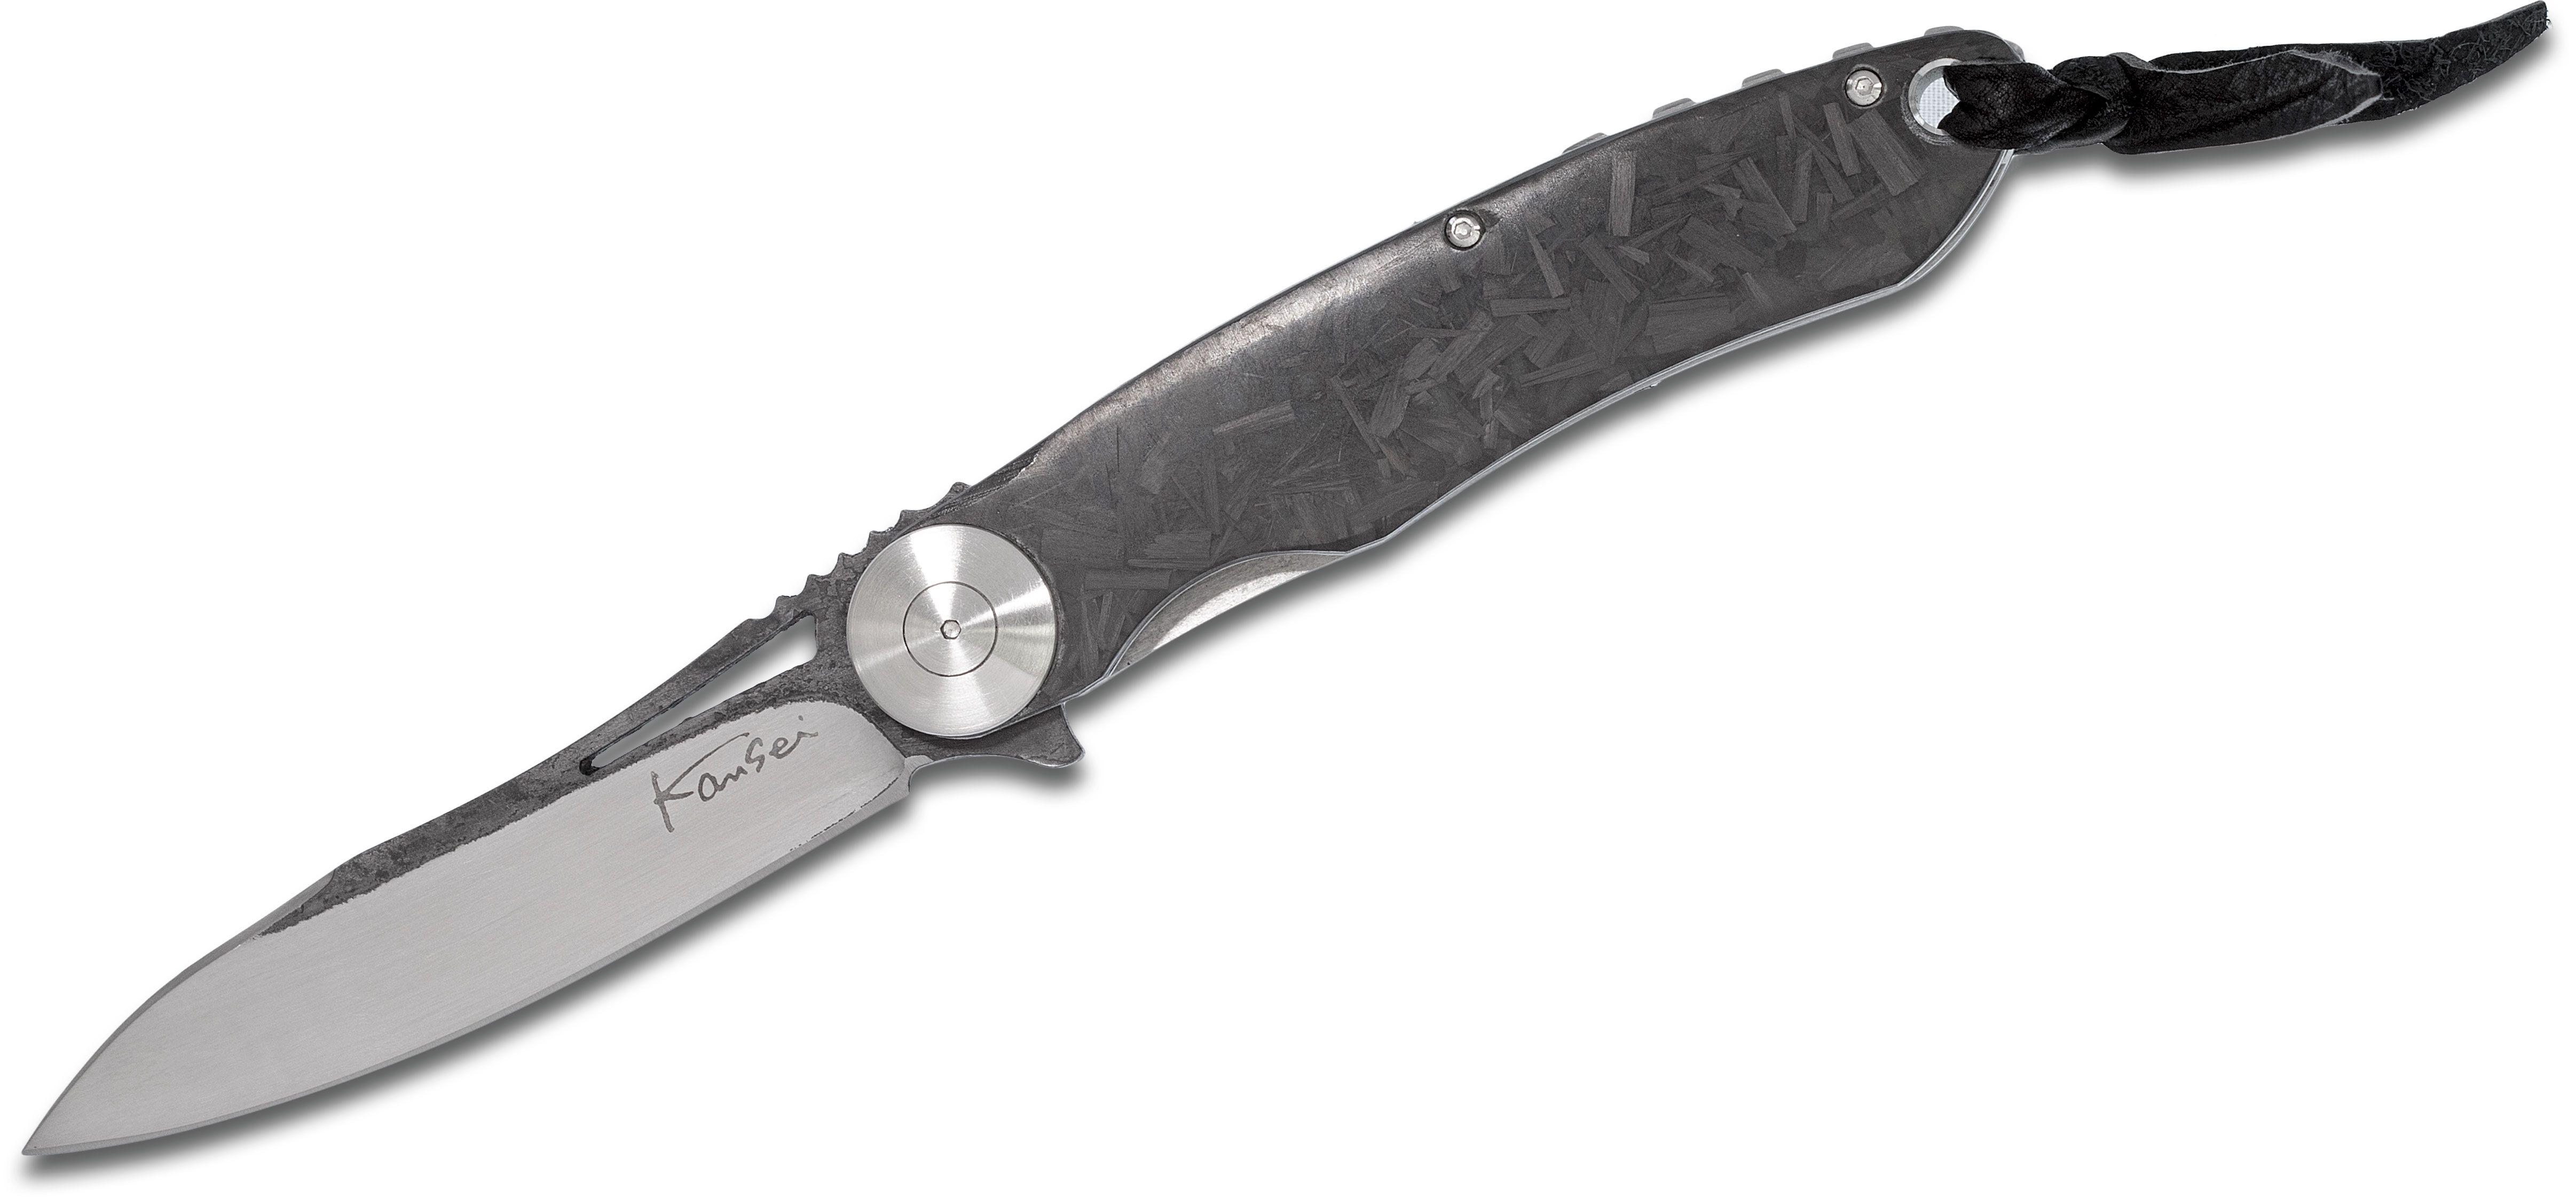 Kansei Matsuno Custom LRF02 Flipper 3.125 inch D2 Sheepsfoot Blade, Shred Carbon Fiber Handles, Leather Pouch